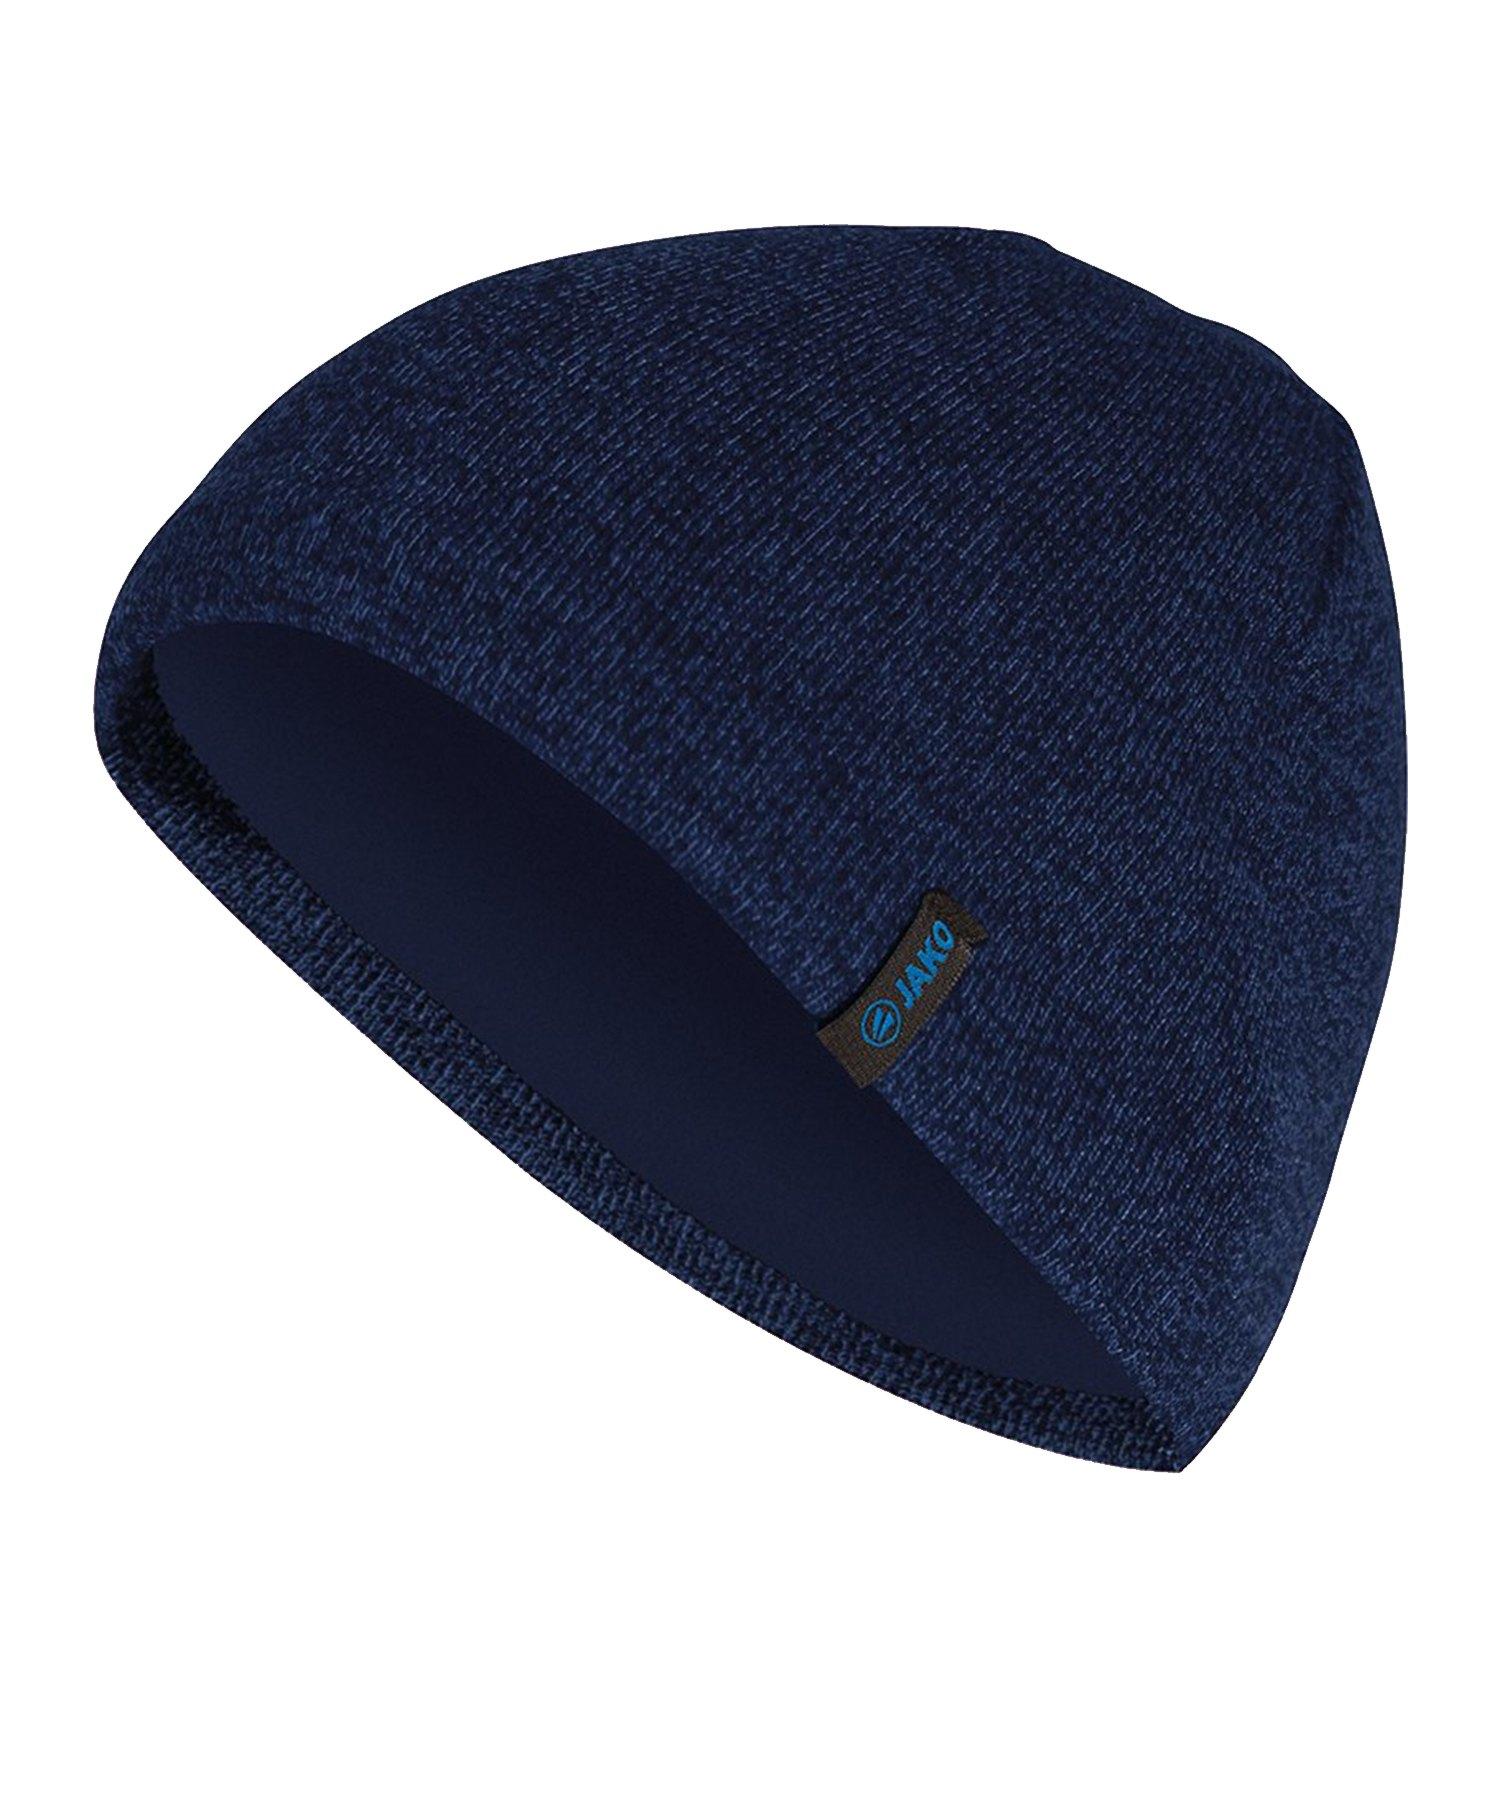 Jako Strickmütze Blau F09 - blau